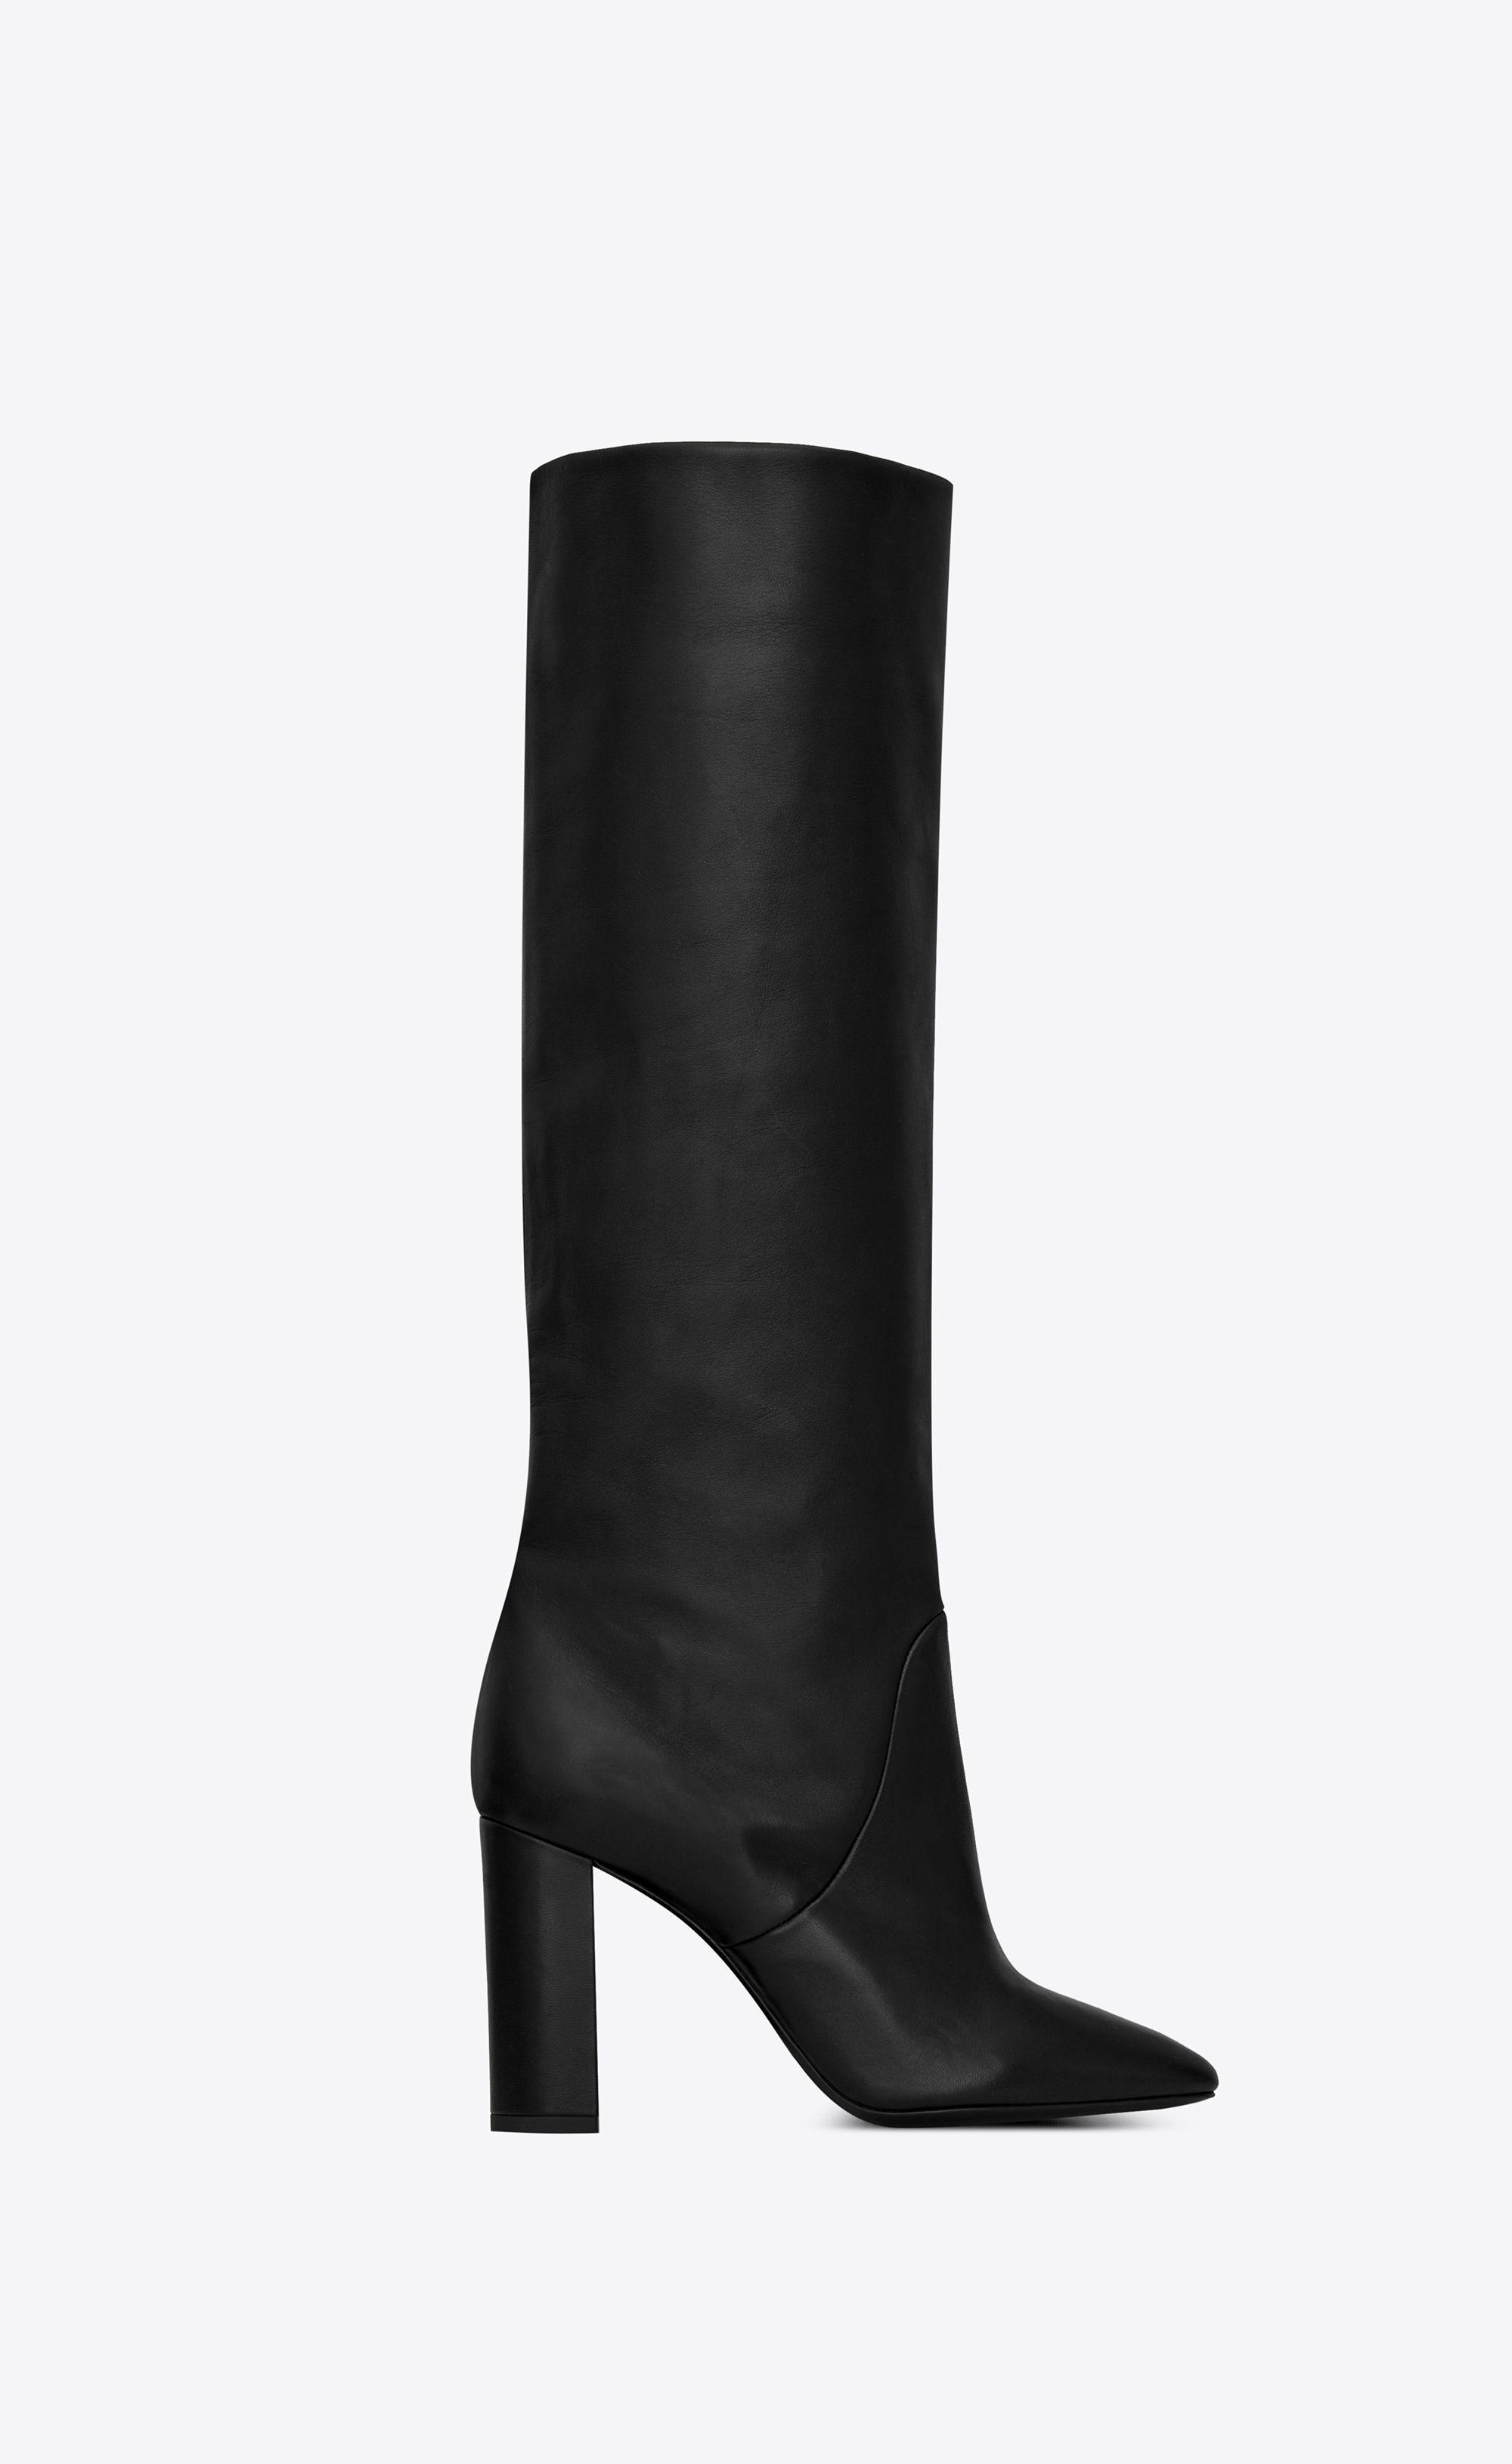 0fbd6c990e Saint Laurent - Lou boot in black lambskin ($1,995) | BOOTS in 2019 ...